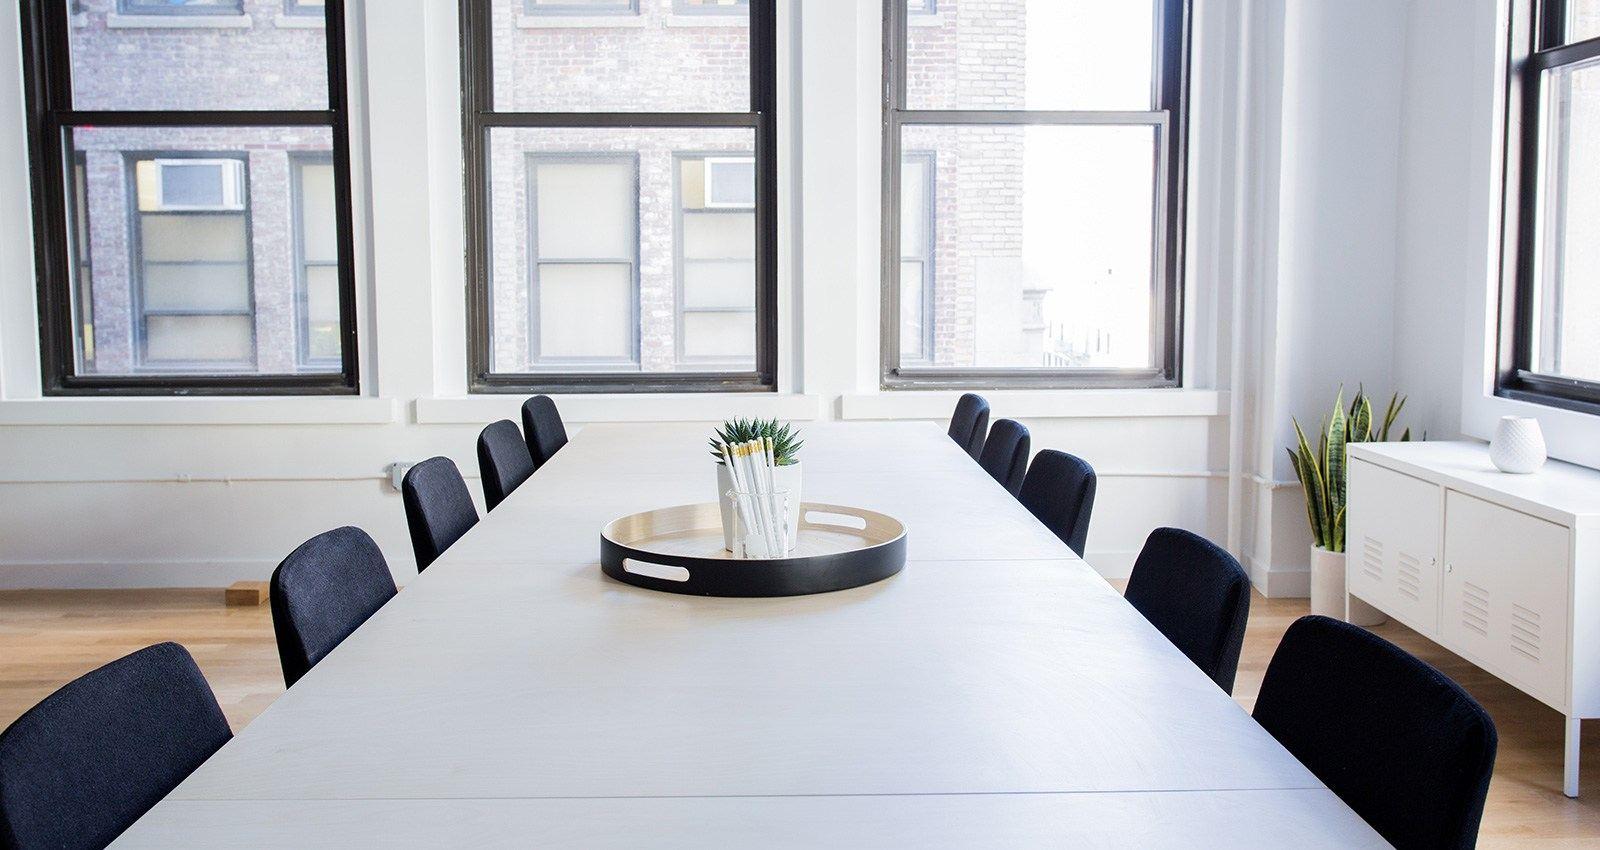 Cisco shakes up collaboration efforts